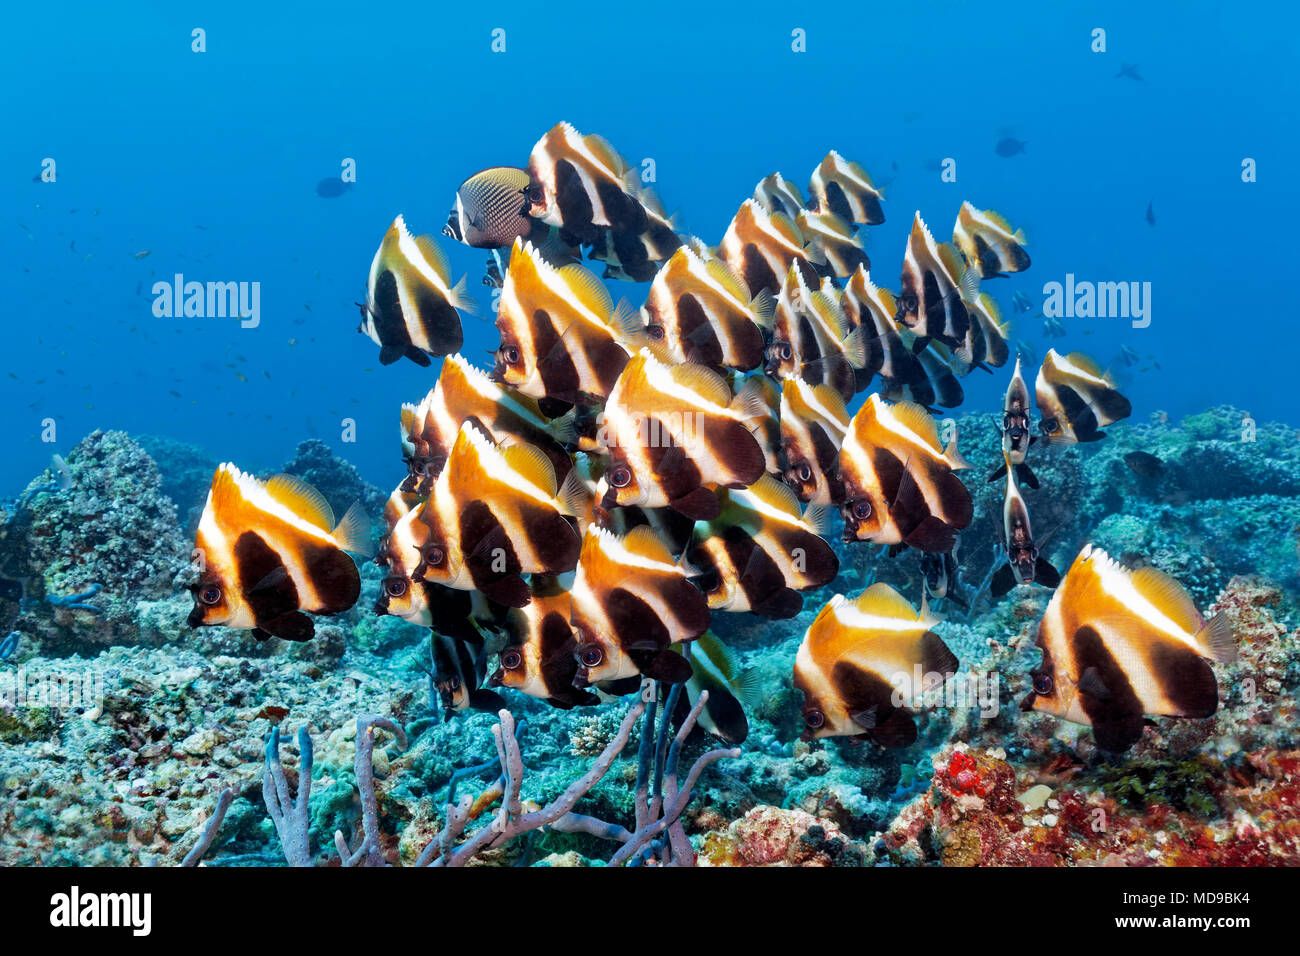 Fish swarm phantom bannerfish (Heniochus pleurotaenia) Indian Ocean, Maldives - Stock Image